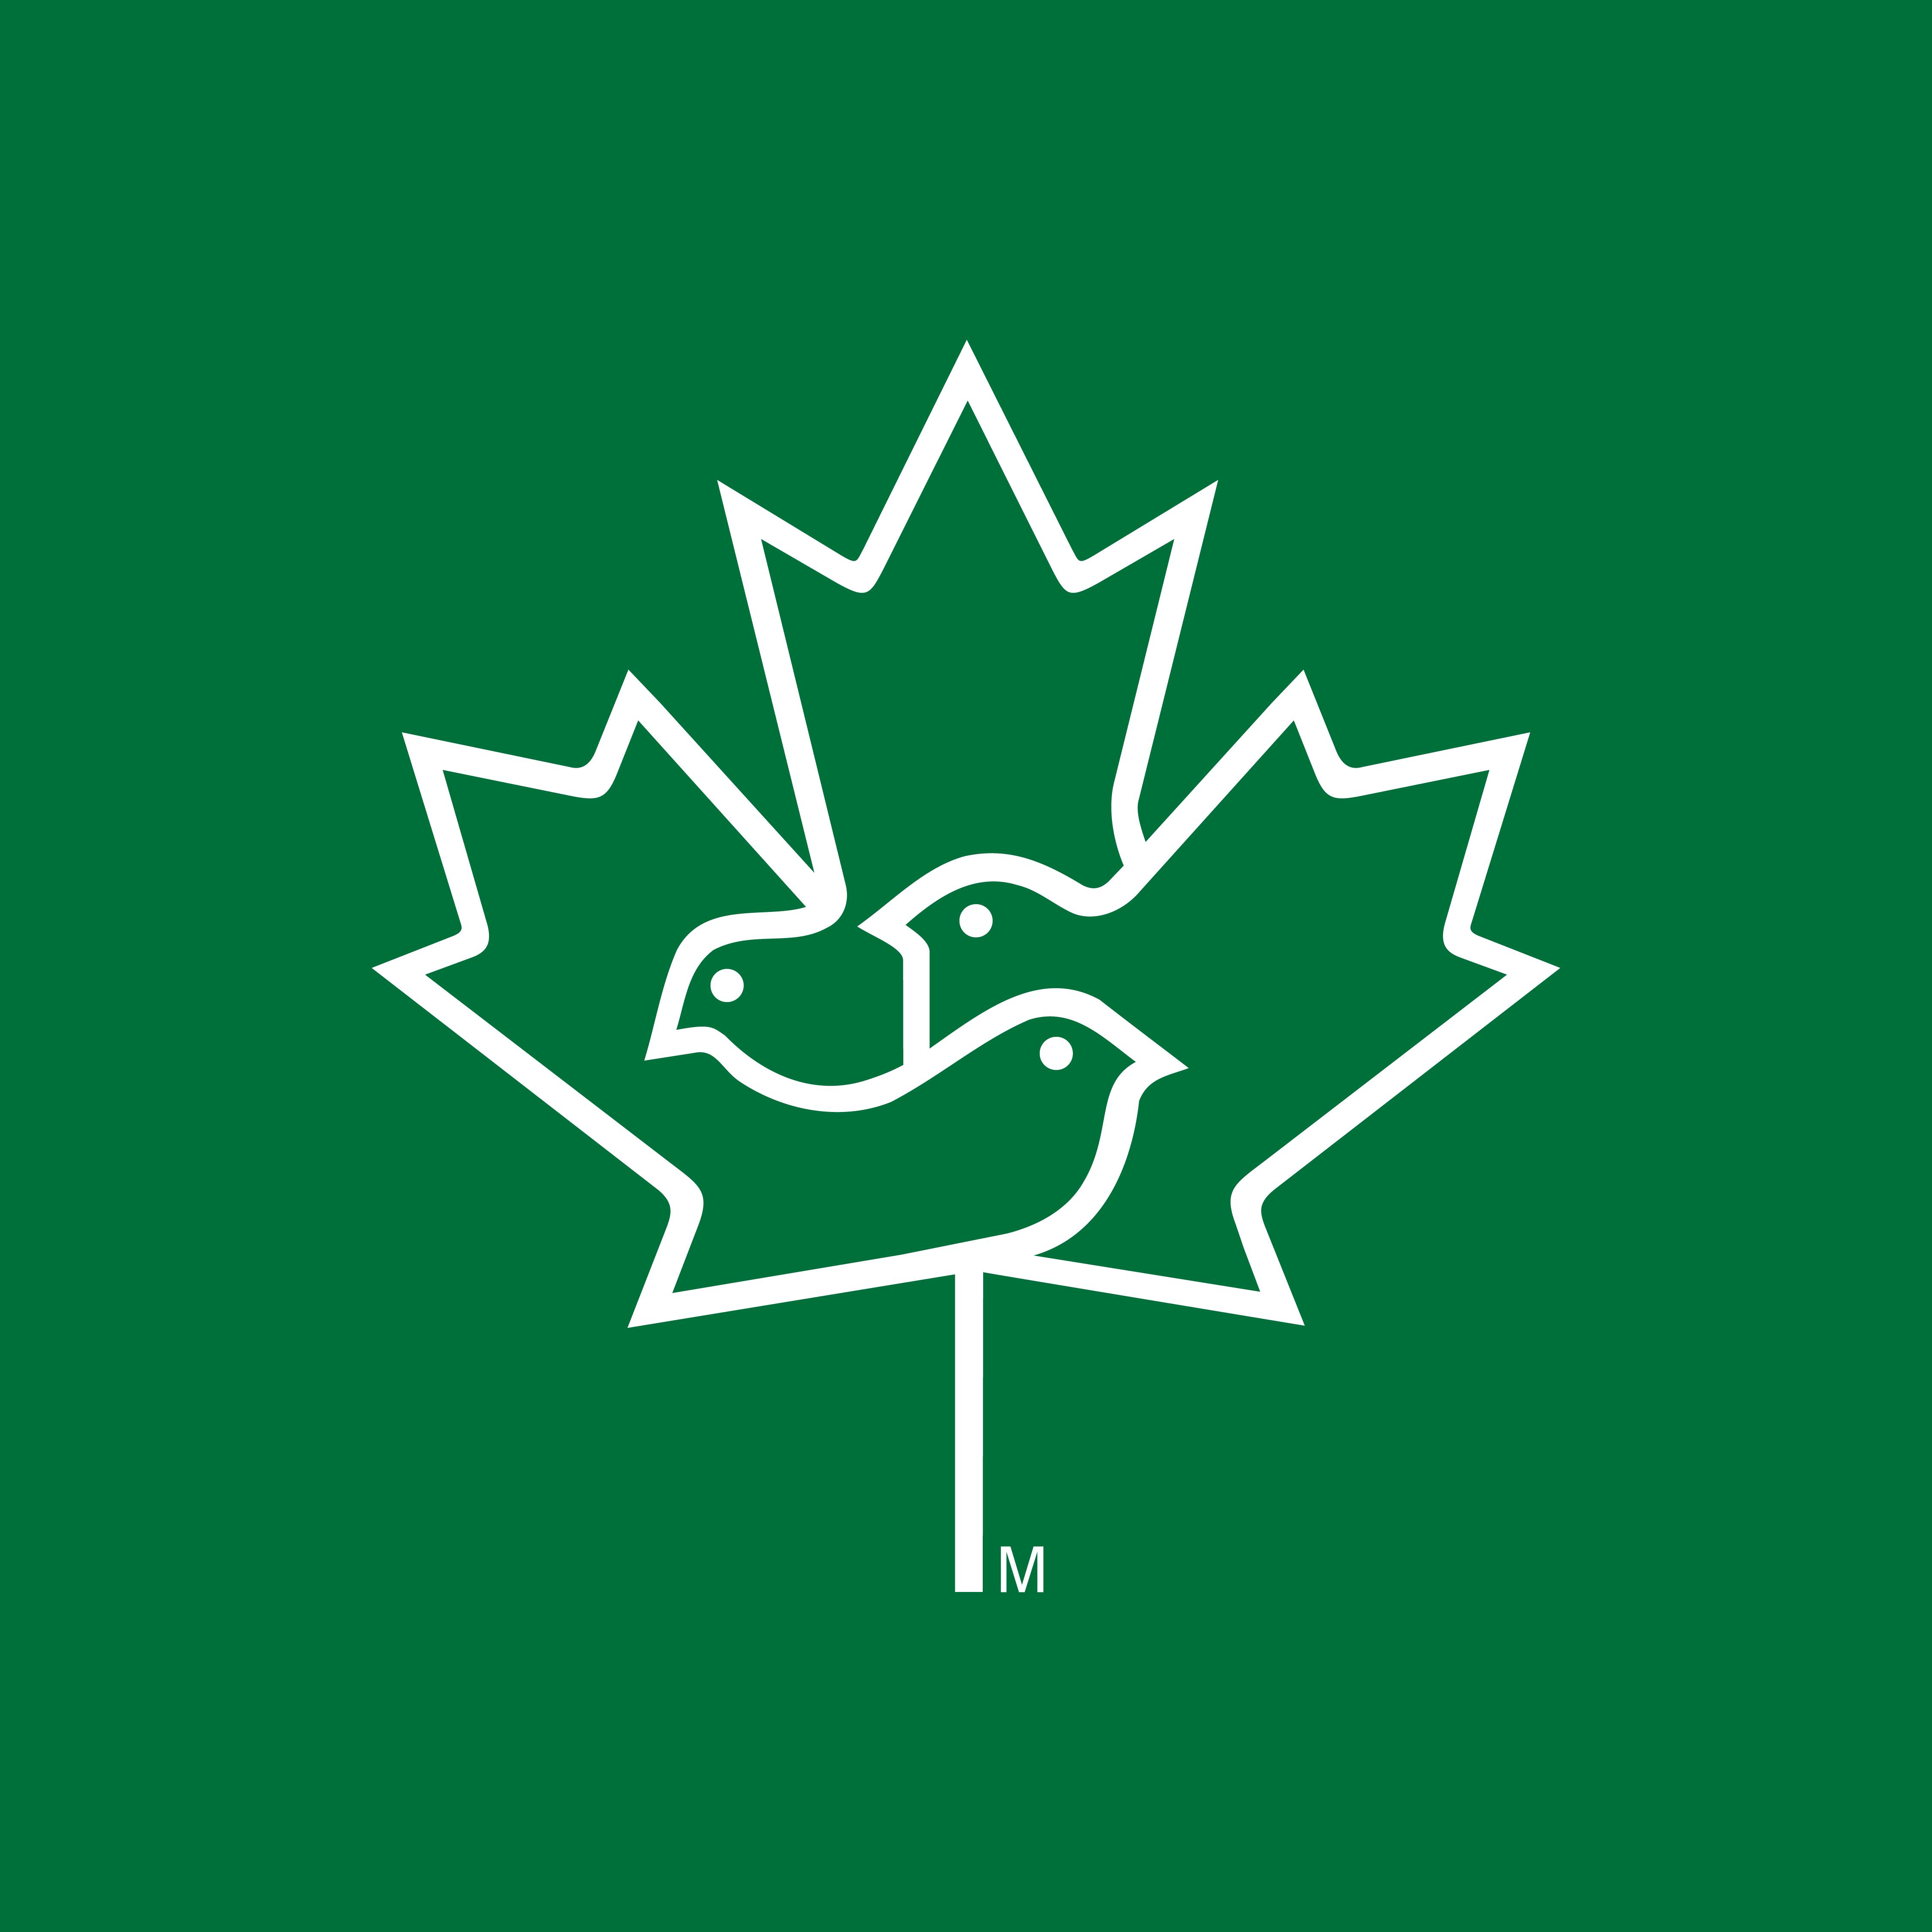 Canada Environmental Choice — Designer: Ted Larson; Firm: Oasis Creative Group Inc., Canada; Year: 1988